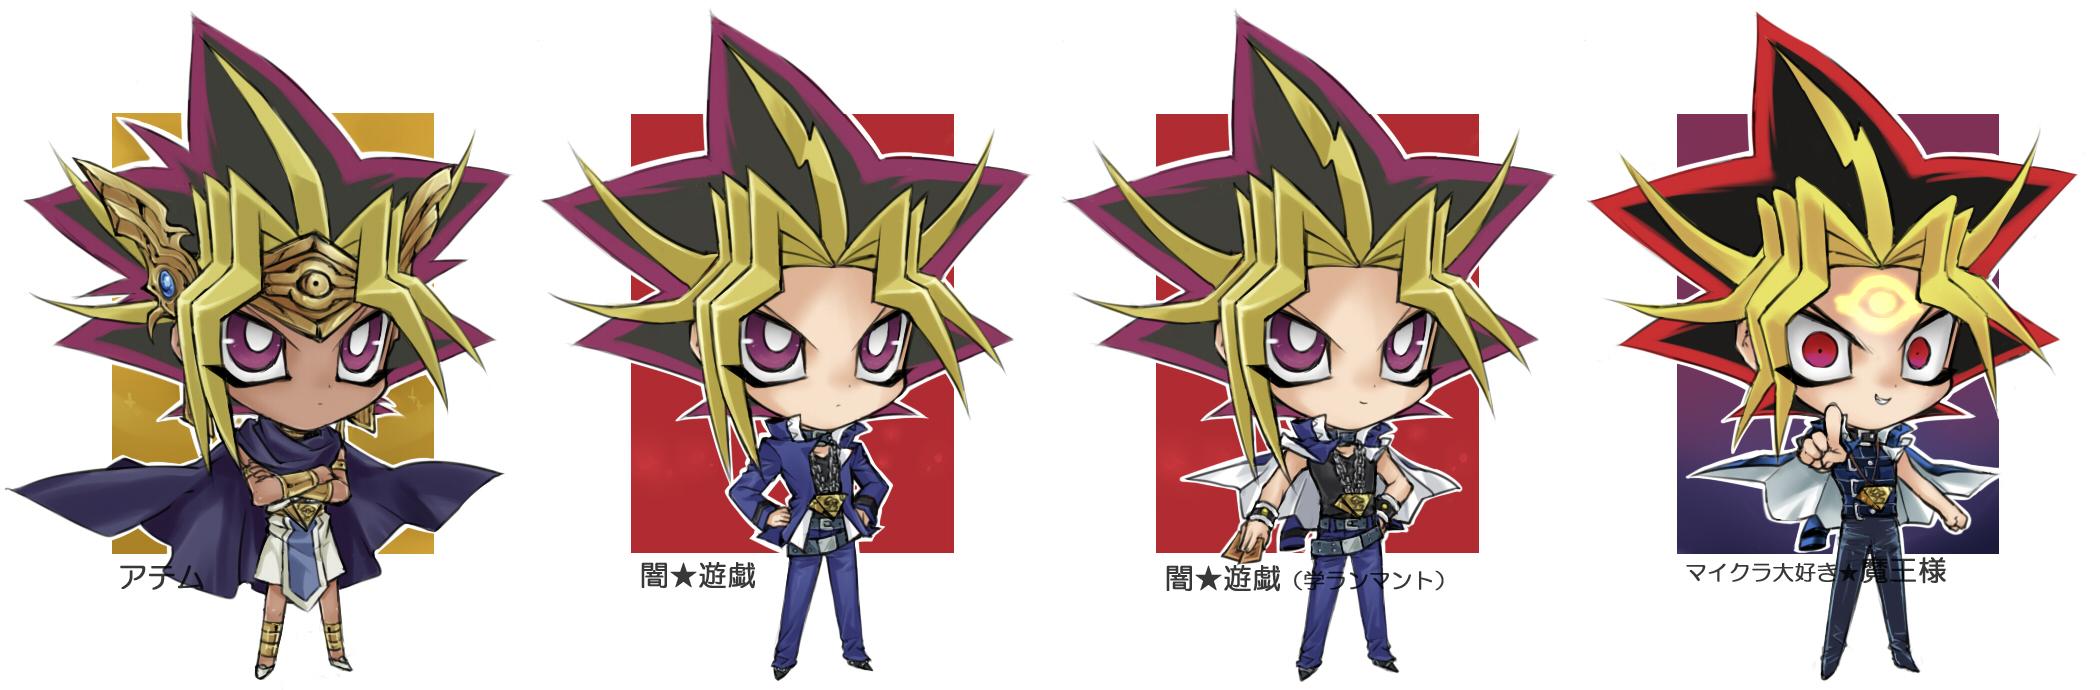 yami yugi yu gi oh duel monsters image 821308 zerochan